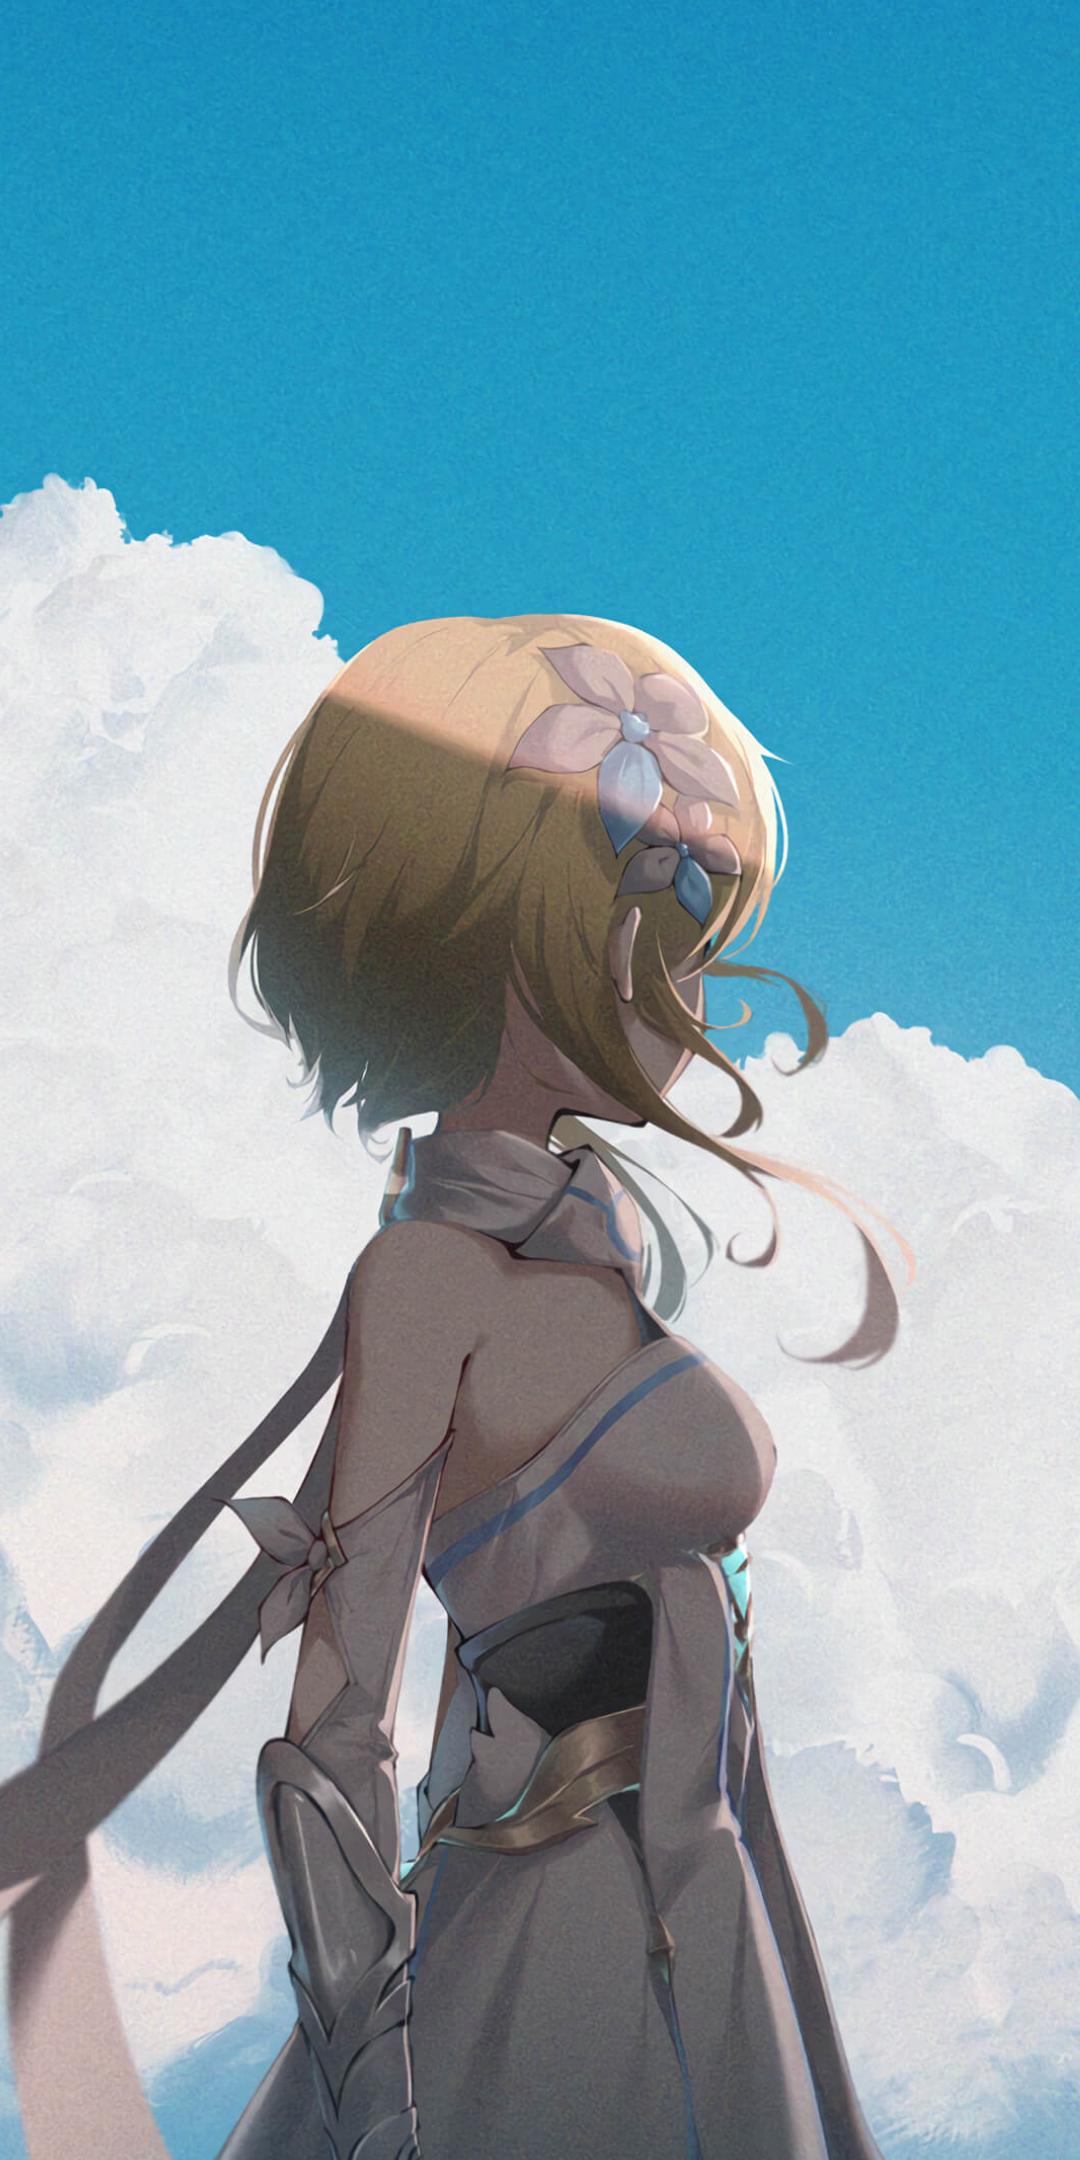 genshin-impact-mobile-wallpaper-2-17